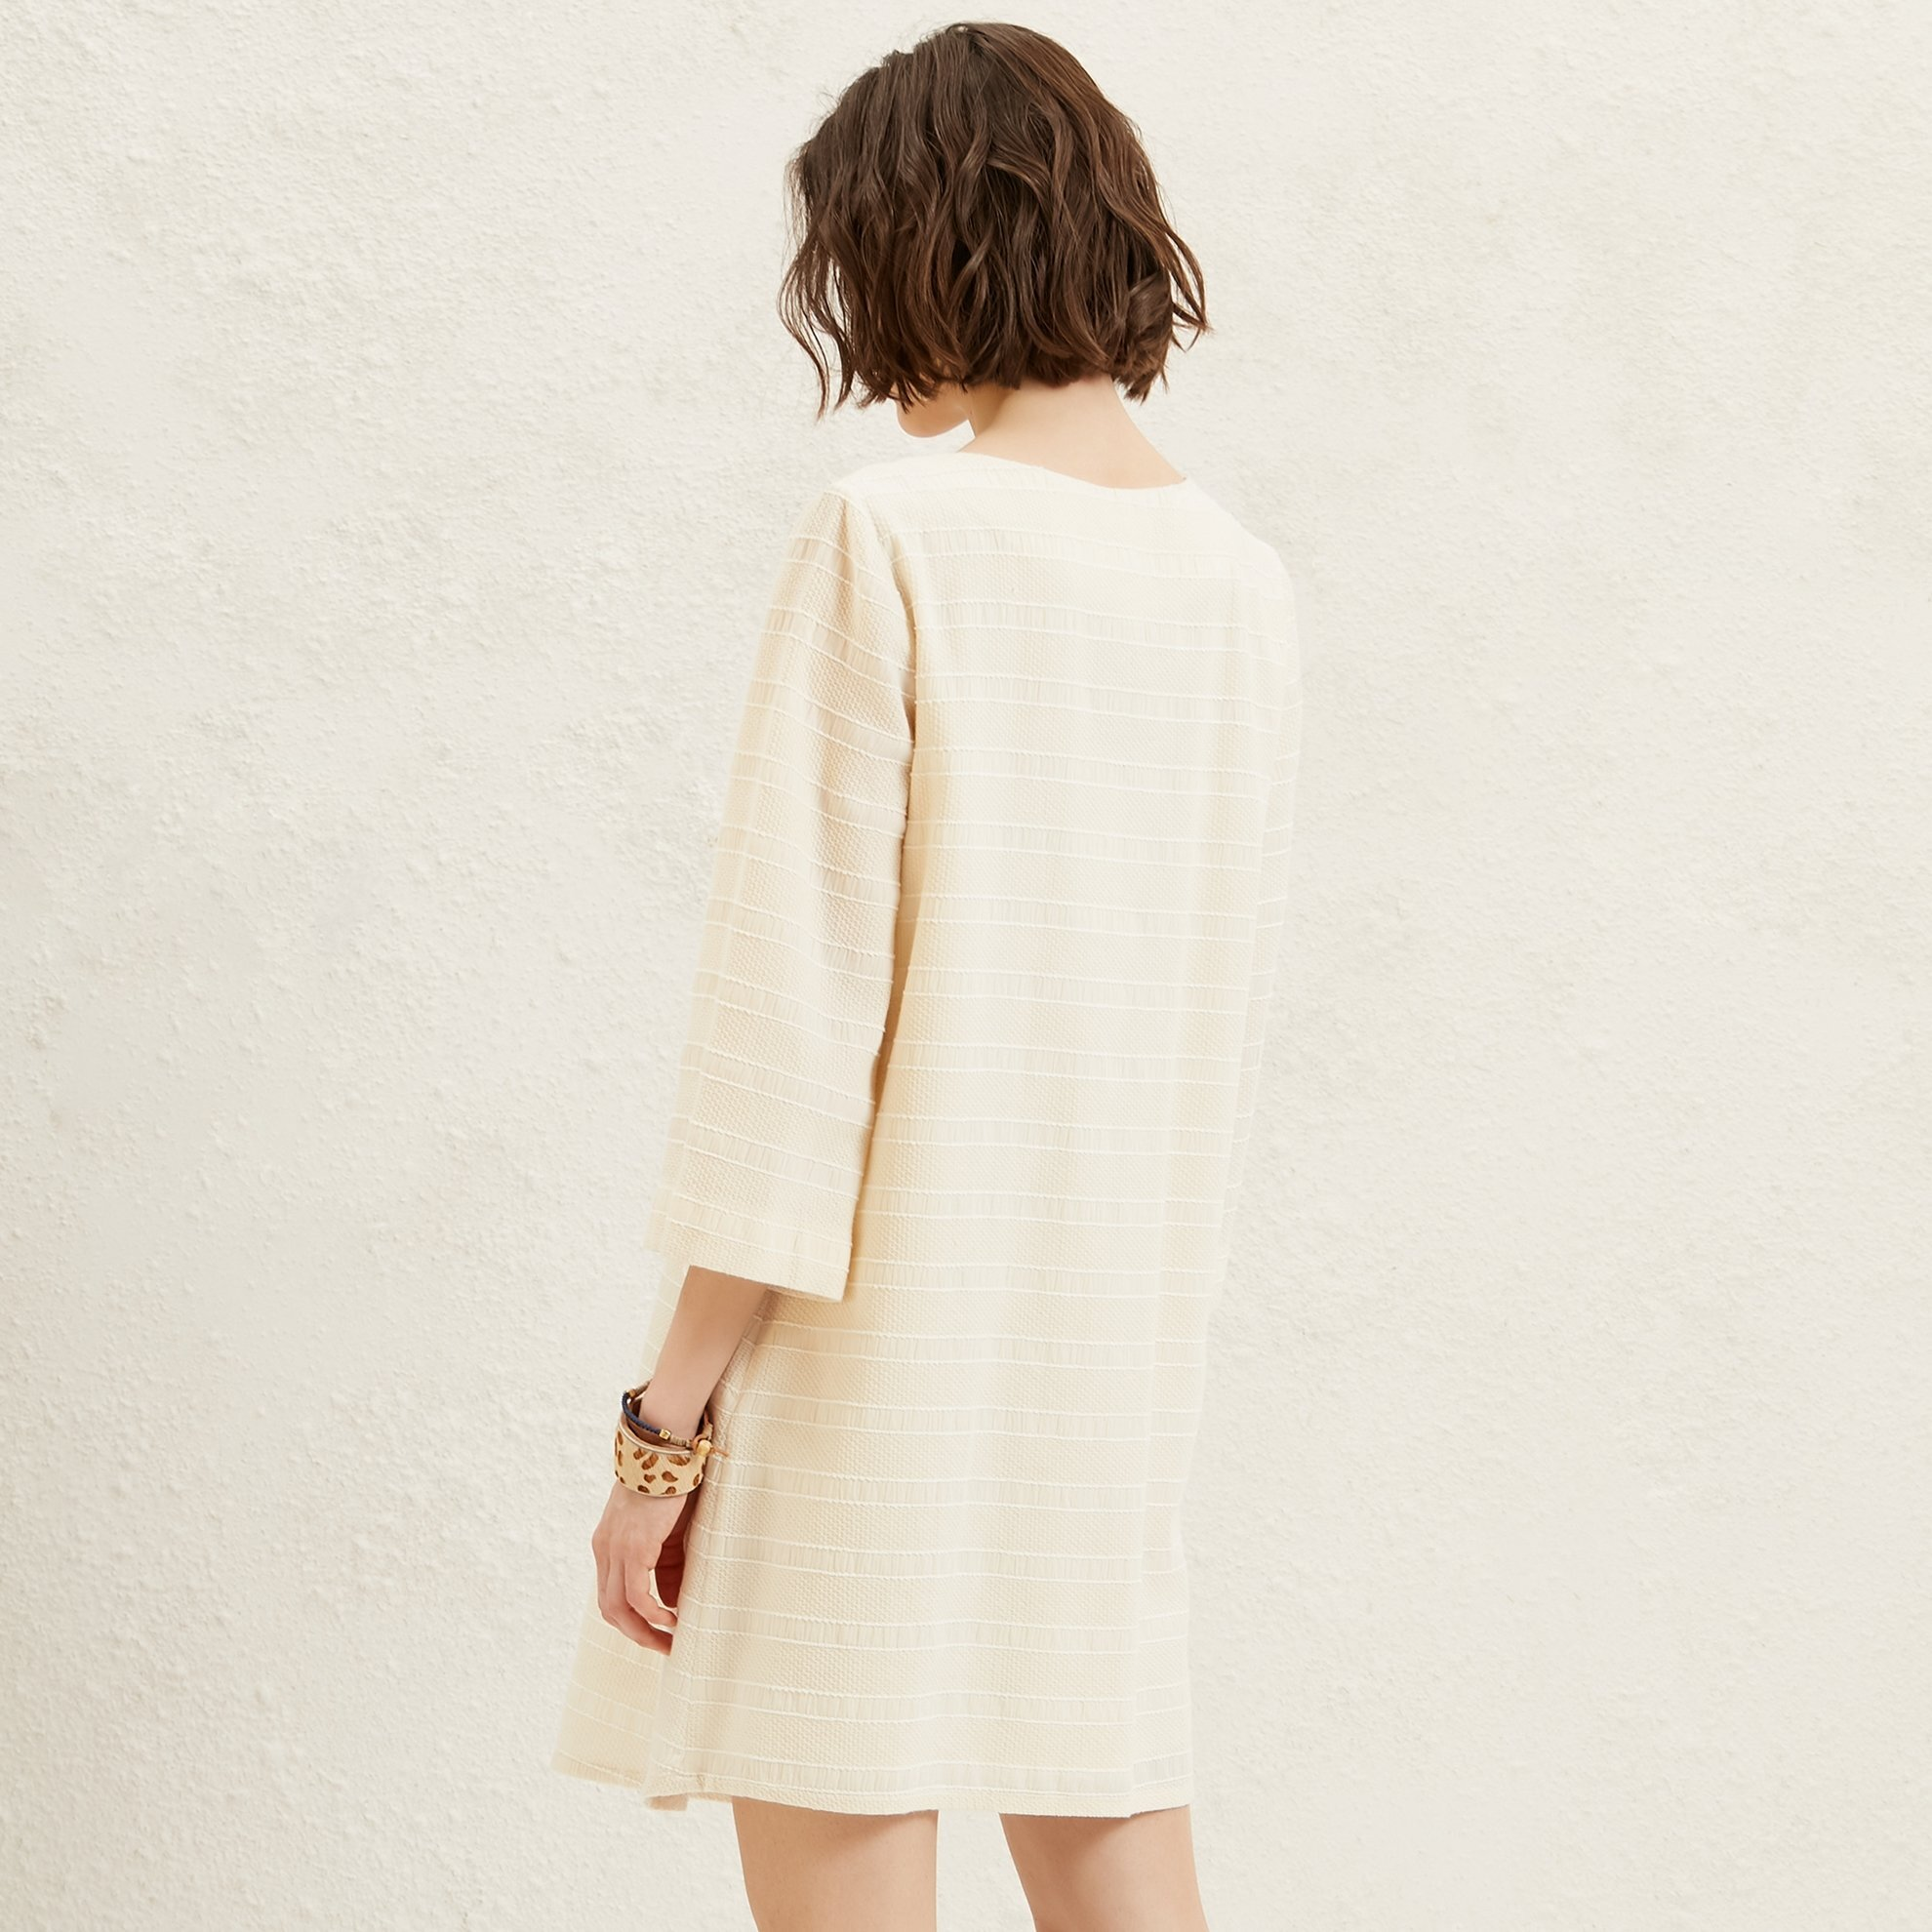 V Neck 374 Sleeve Dress